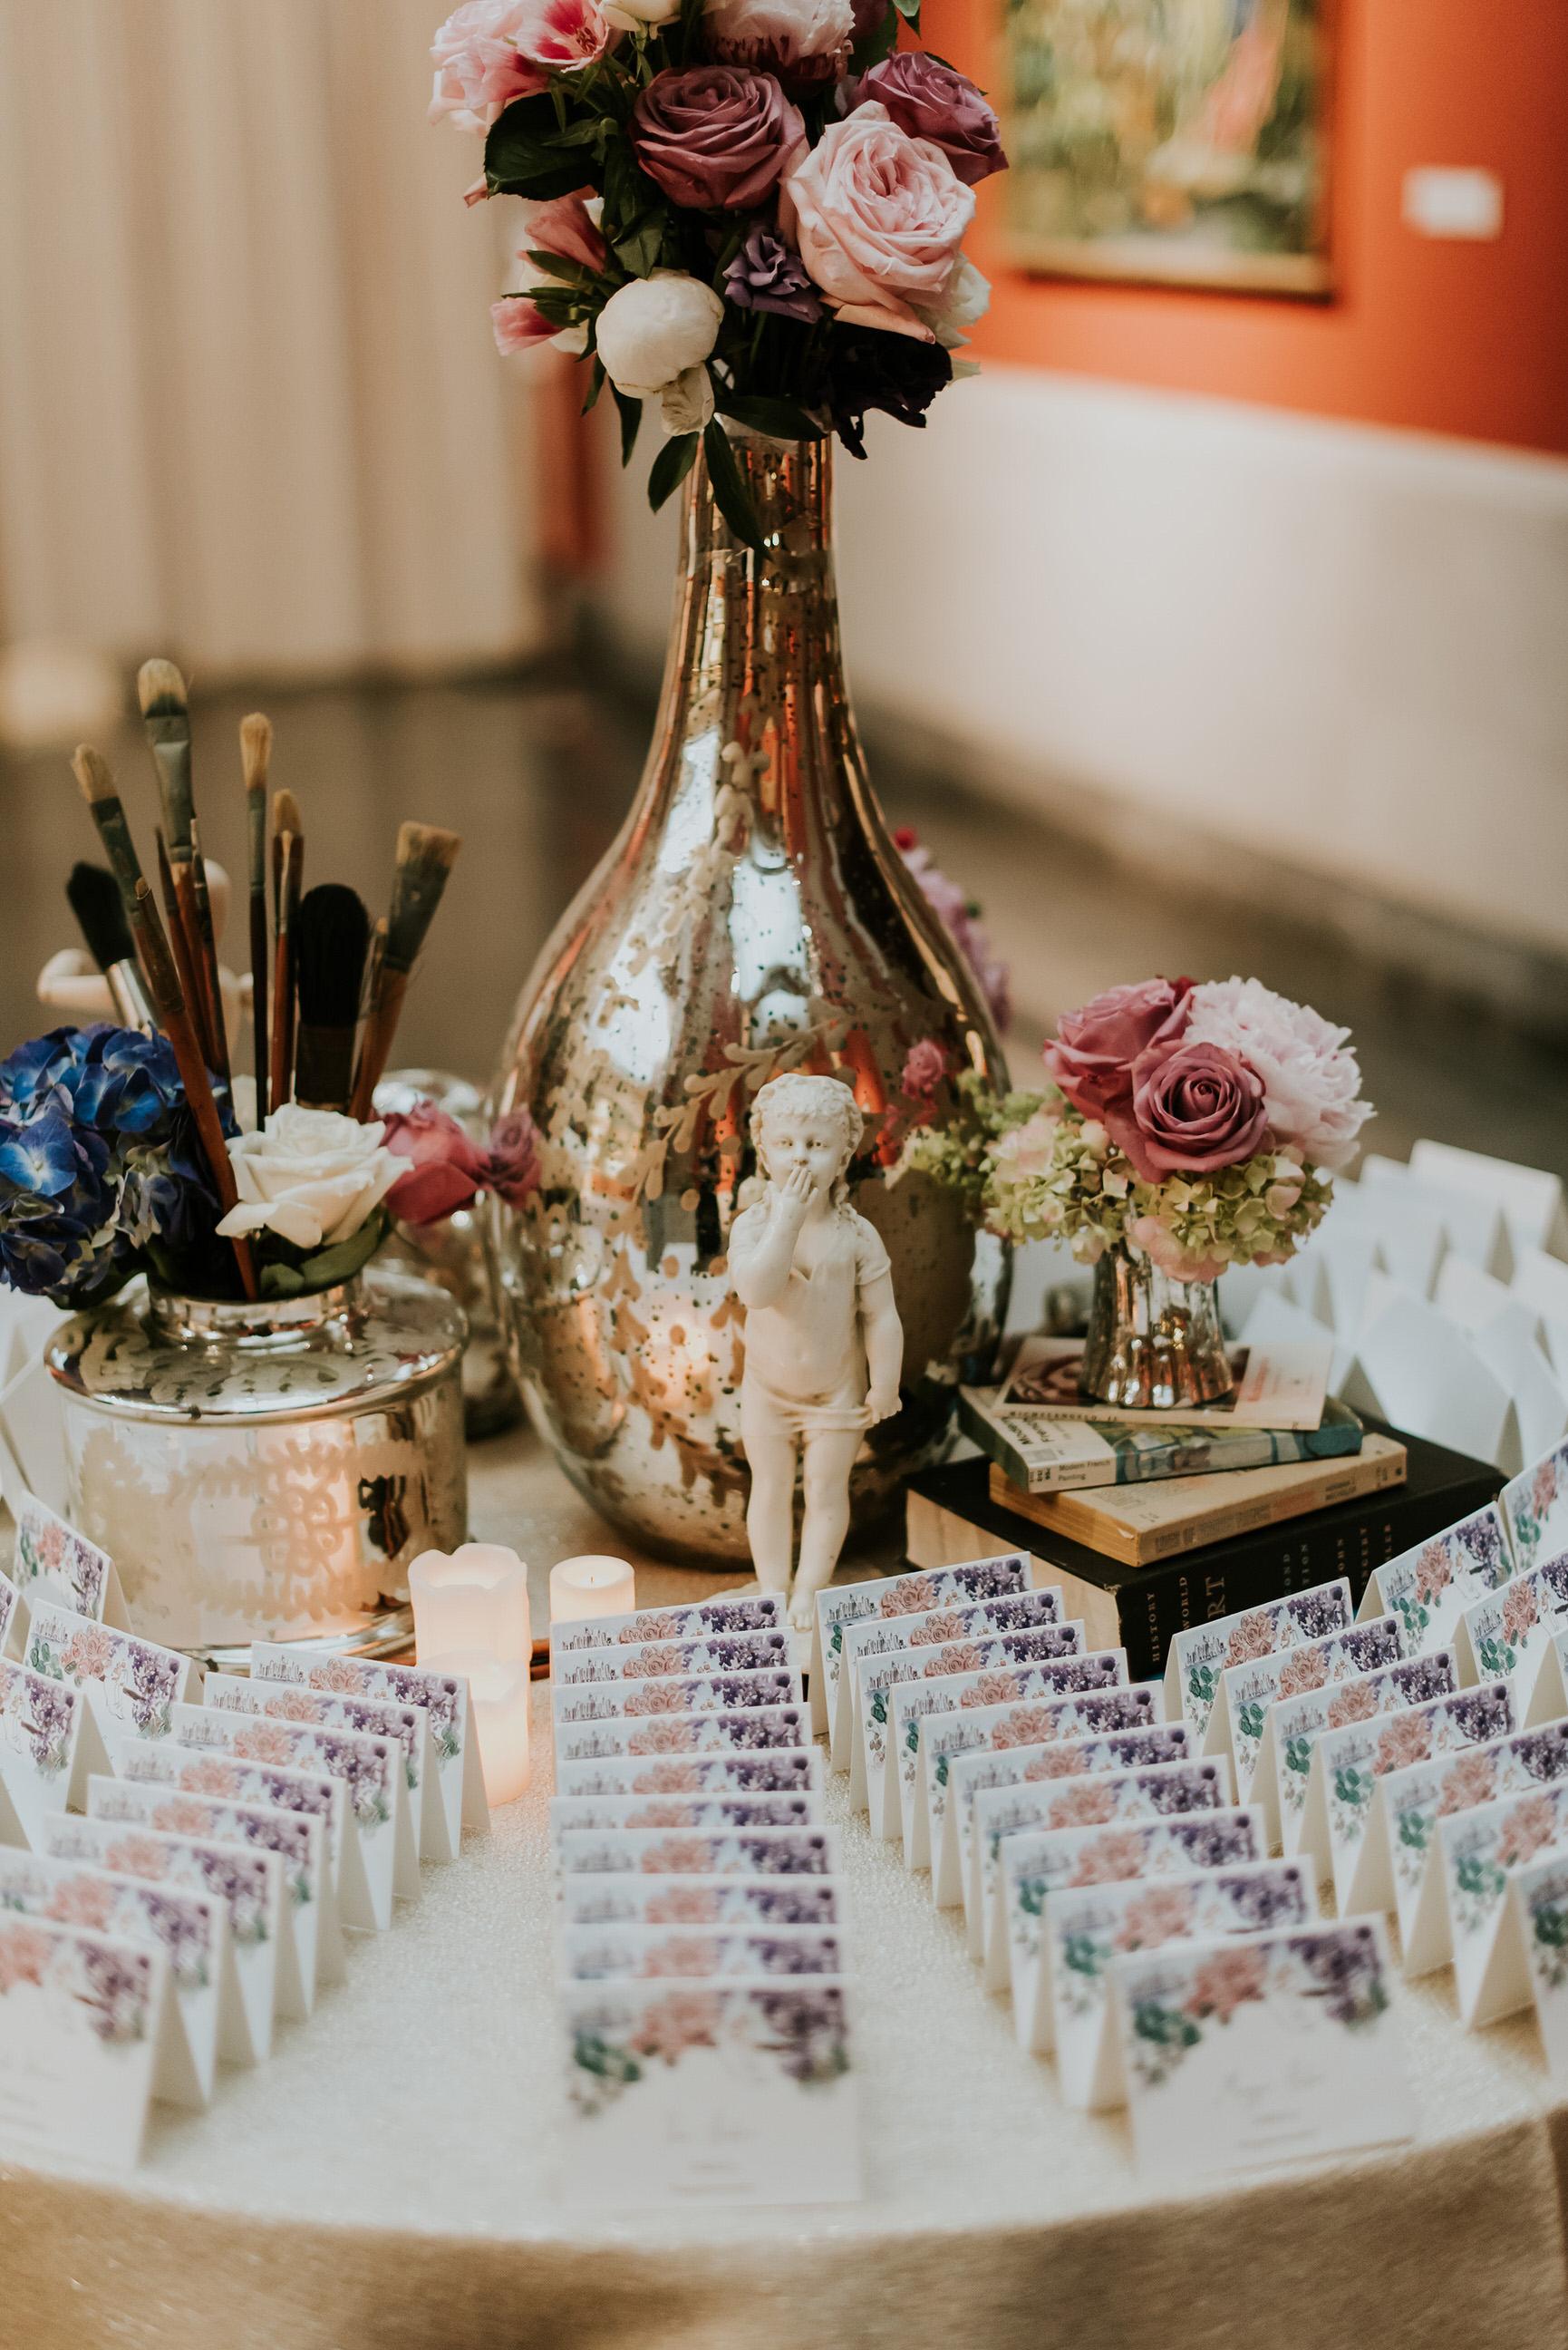 51 Art Museum Wedding Centerpiece Hydrangea Rose Blush Mauve Navy Mercury Glass Escort Card Table.jpg